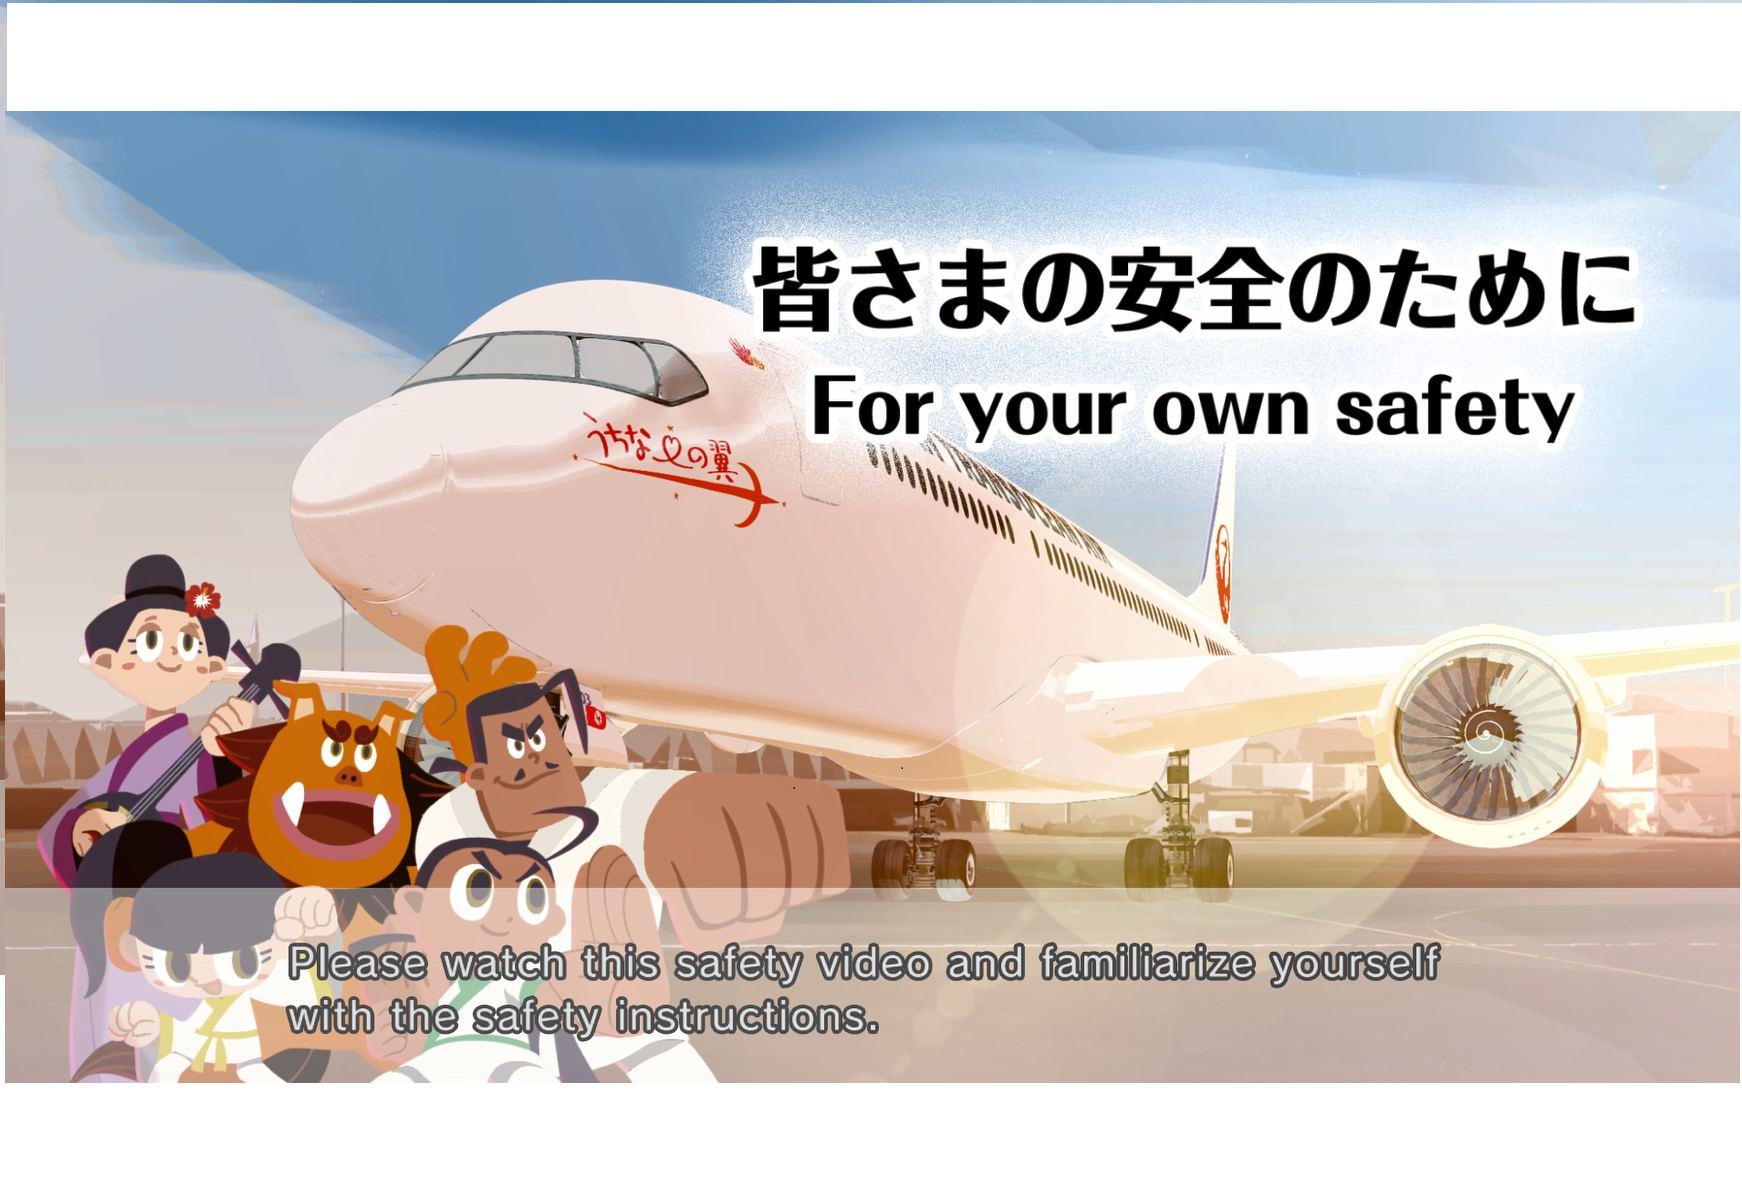 JTAオリジナル機内安全ビデオを期間限定上映!